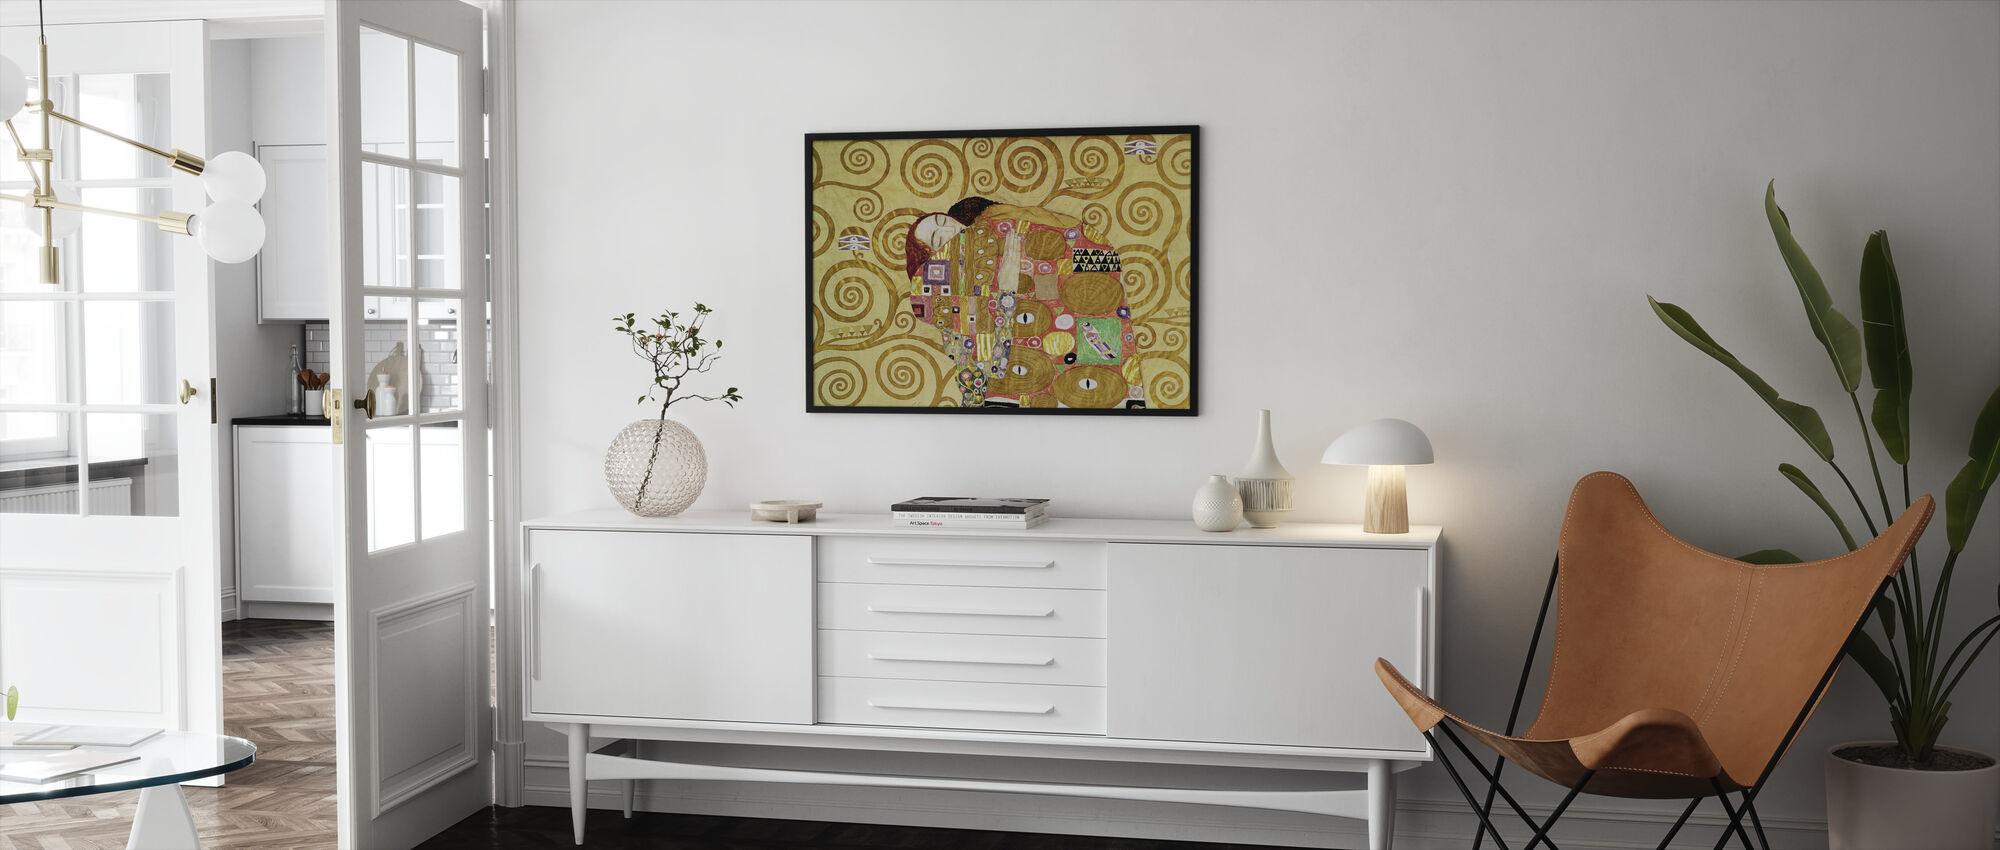 Vervulling - Gustav Klimt - Ingelijste print - Woonkamer